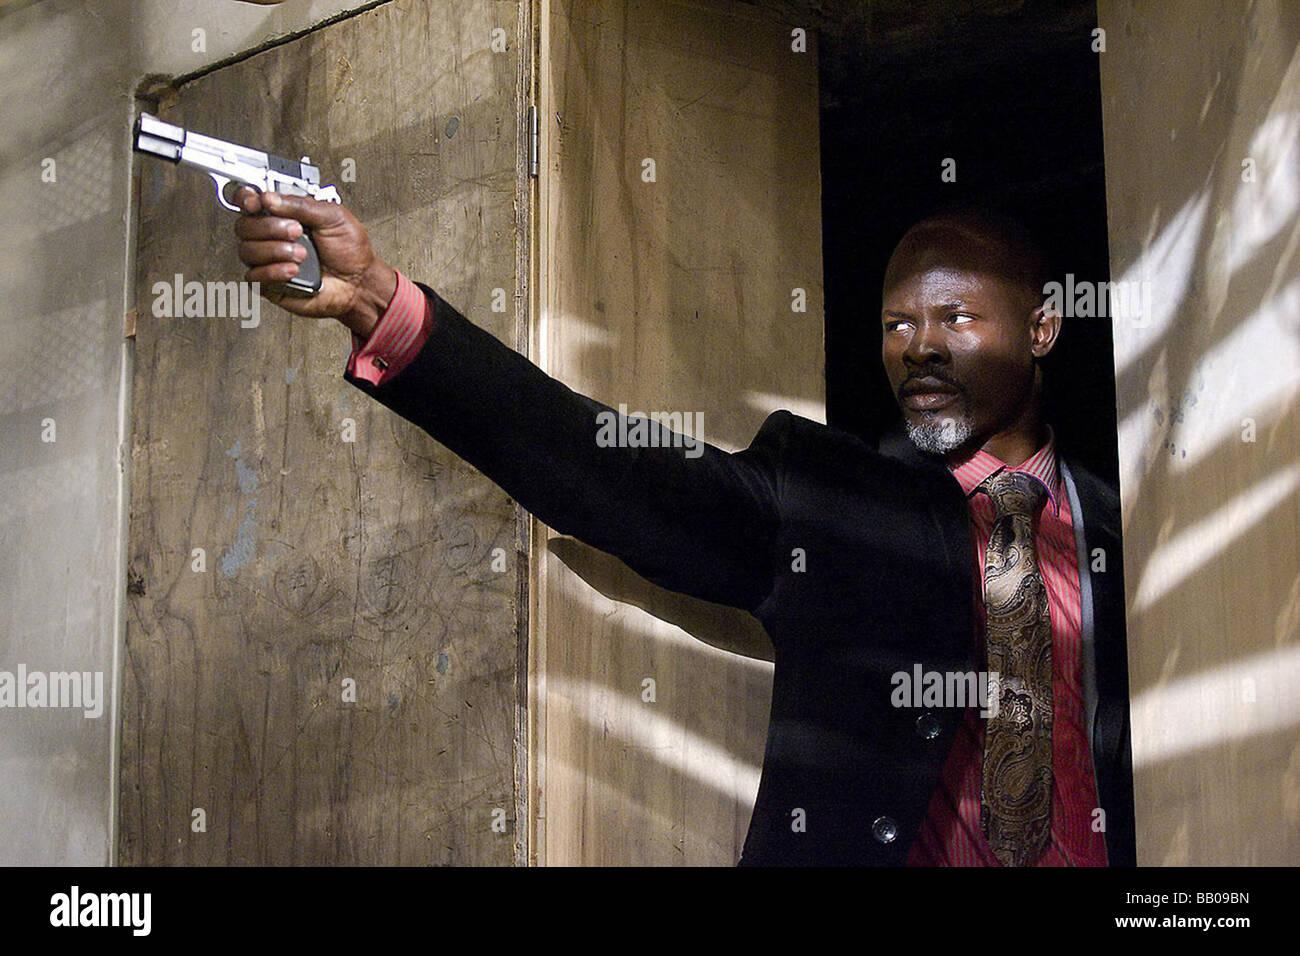 Push Year : 2009 Director : Paul McGuigan Djimon Hounson - Stock Image